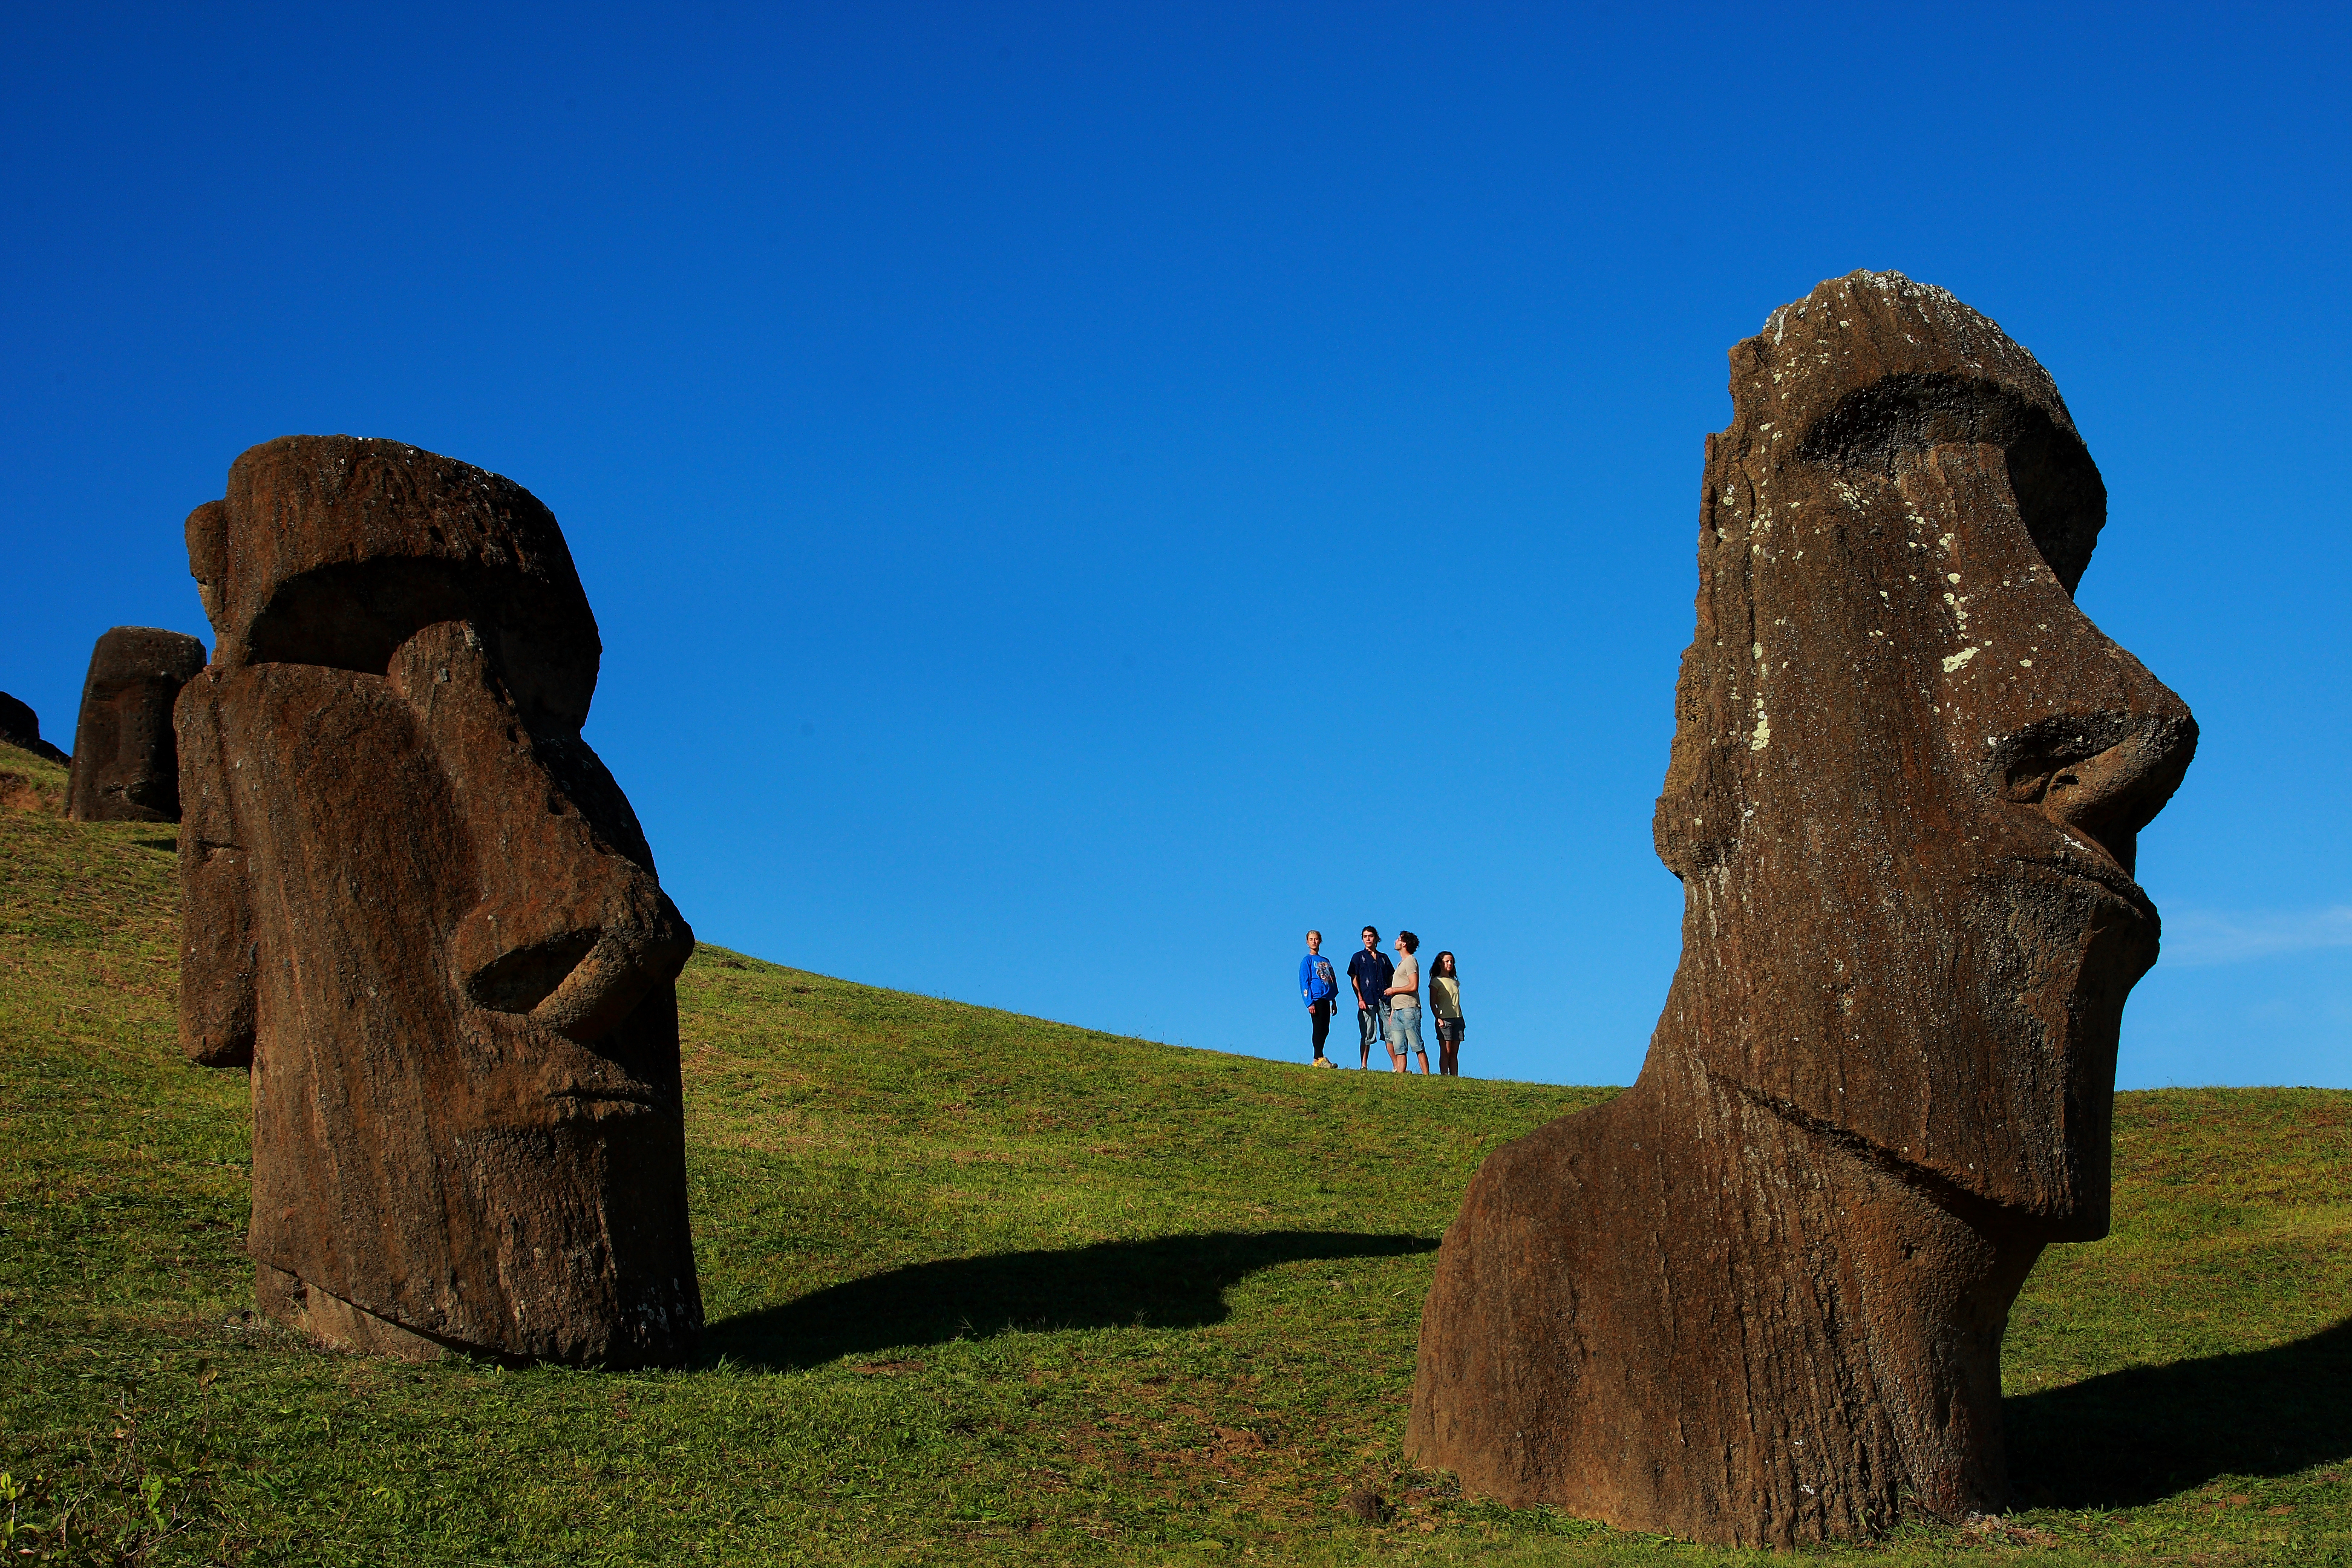 Moai at Rano Raraku. Image courtesy of Sunvil Latin America